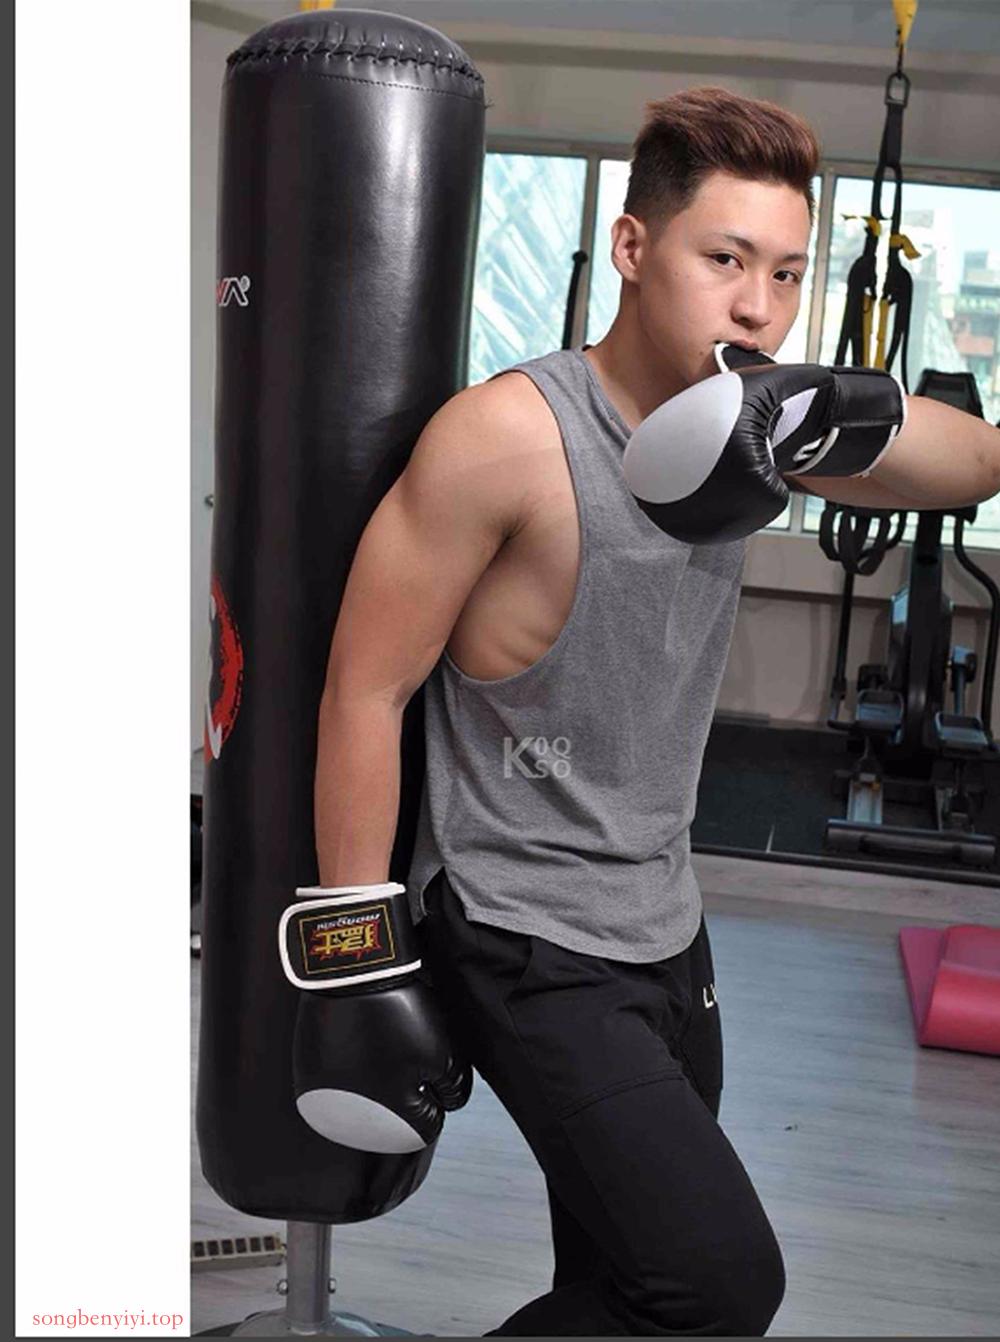 BE A MODEL 10高雄健身教練 躍身成為寫真男模 ED-28.png